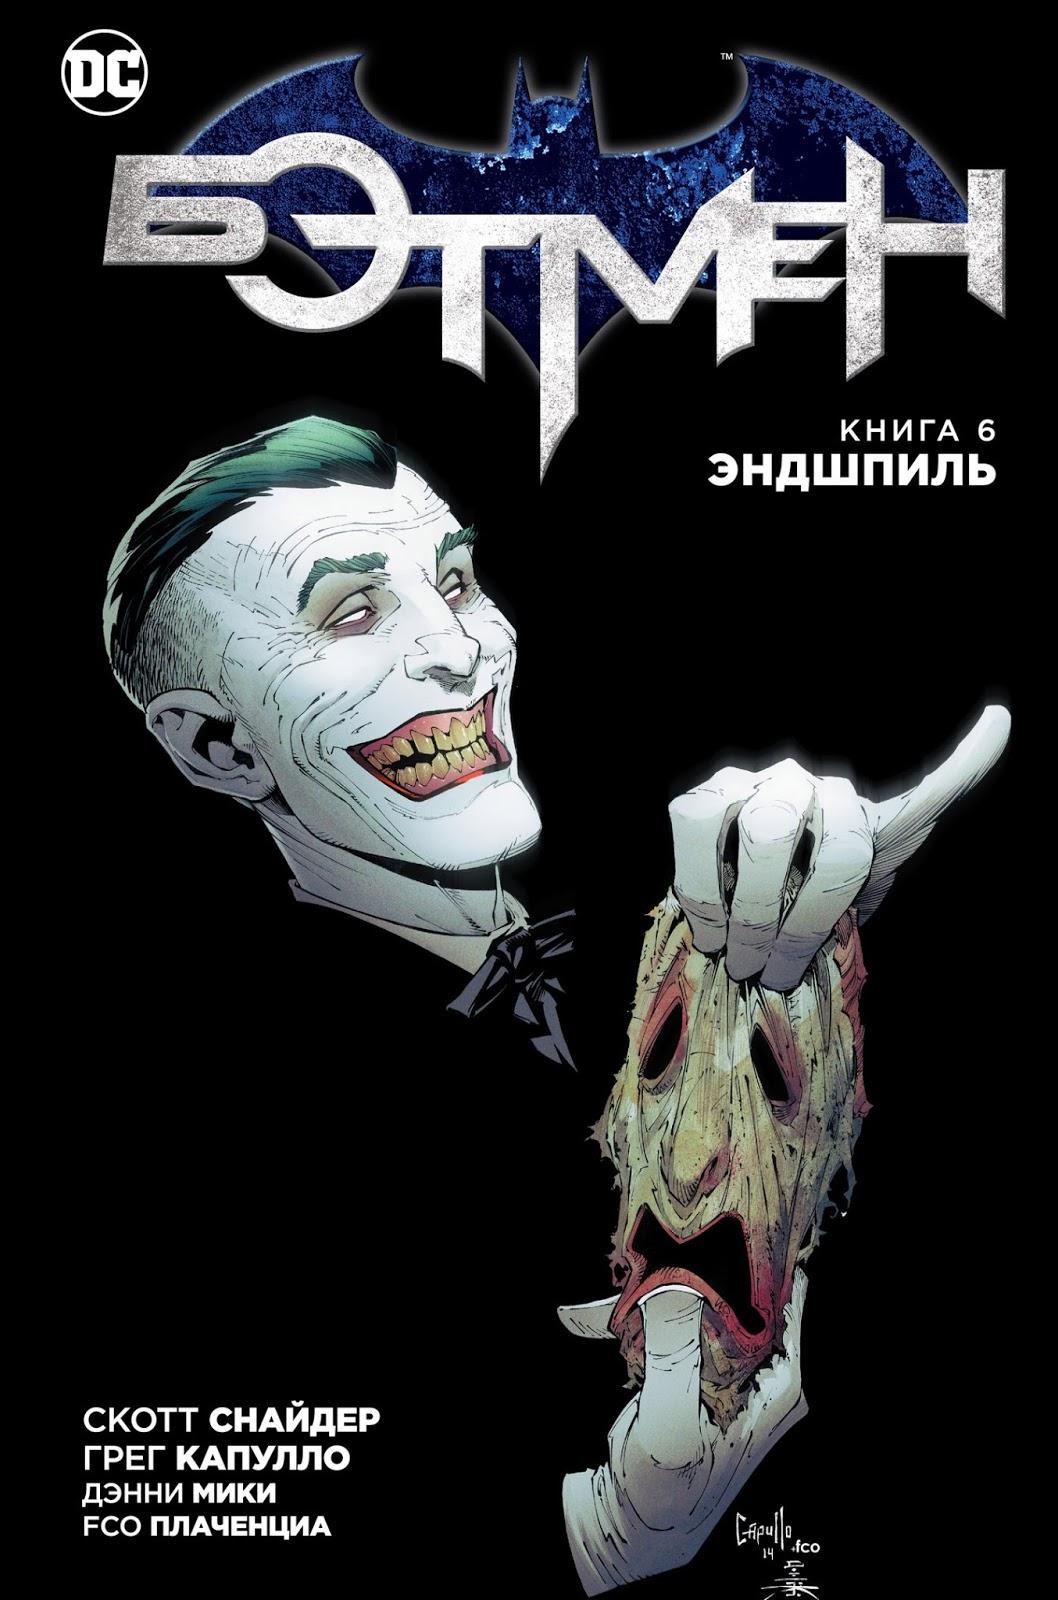 Комикс «Бэтмен. Книга 6. Эндшпиль» (2015)